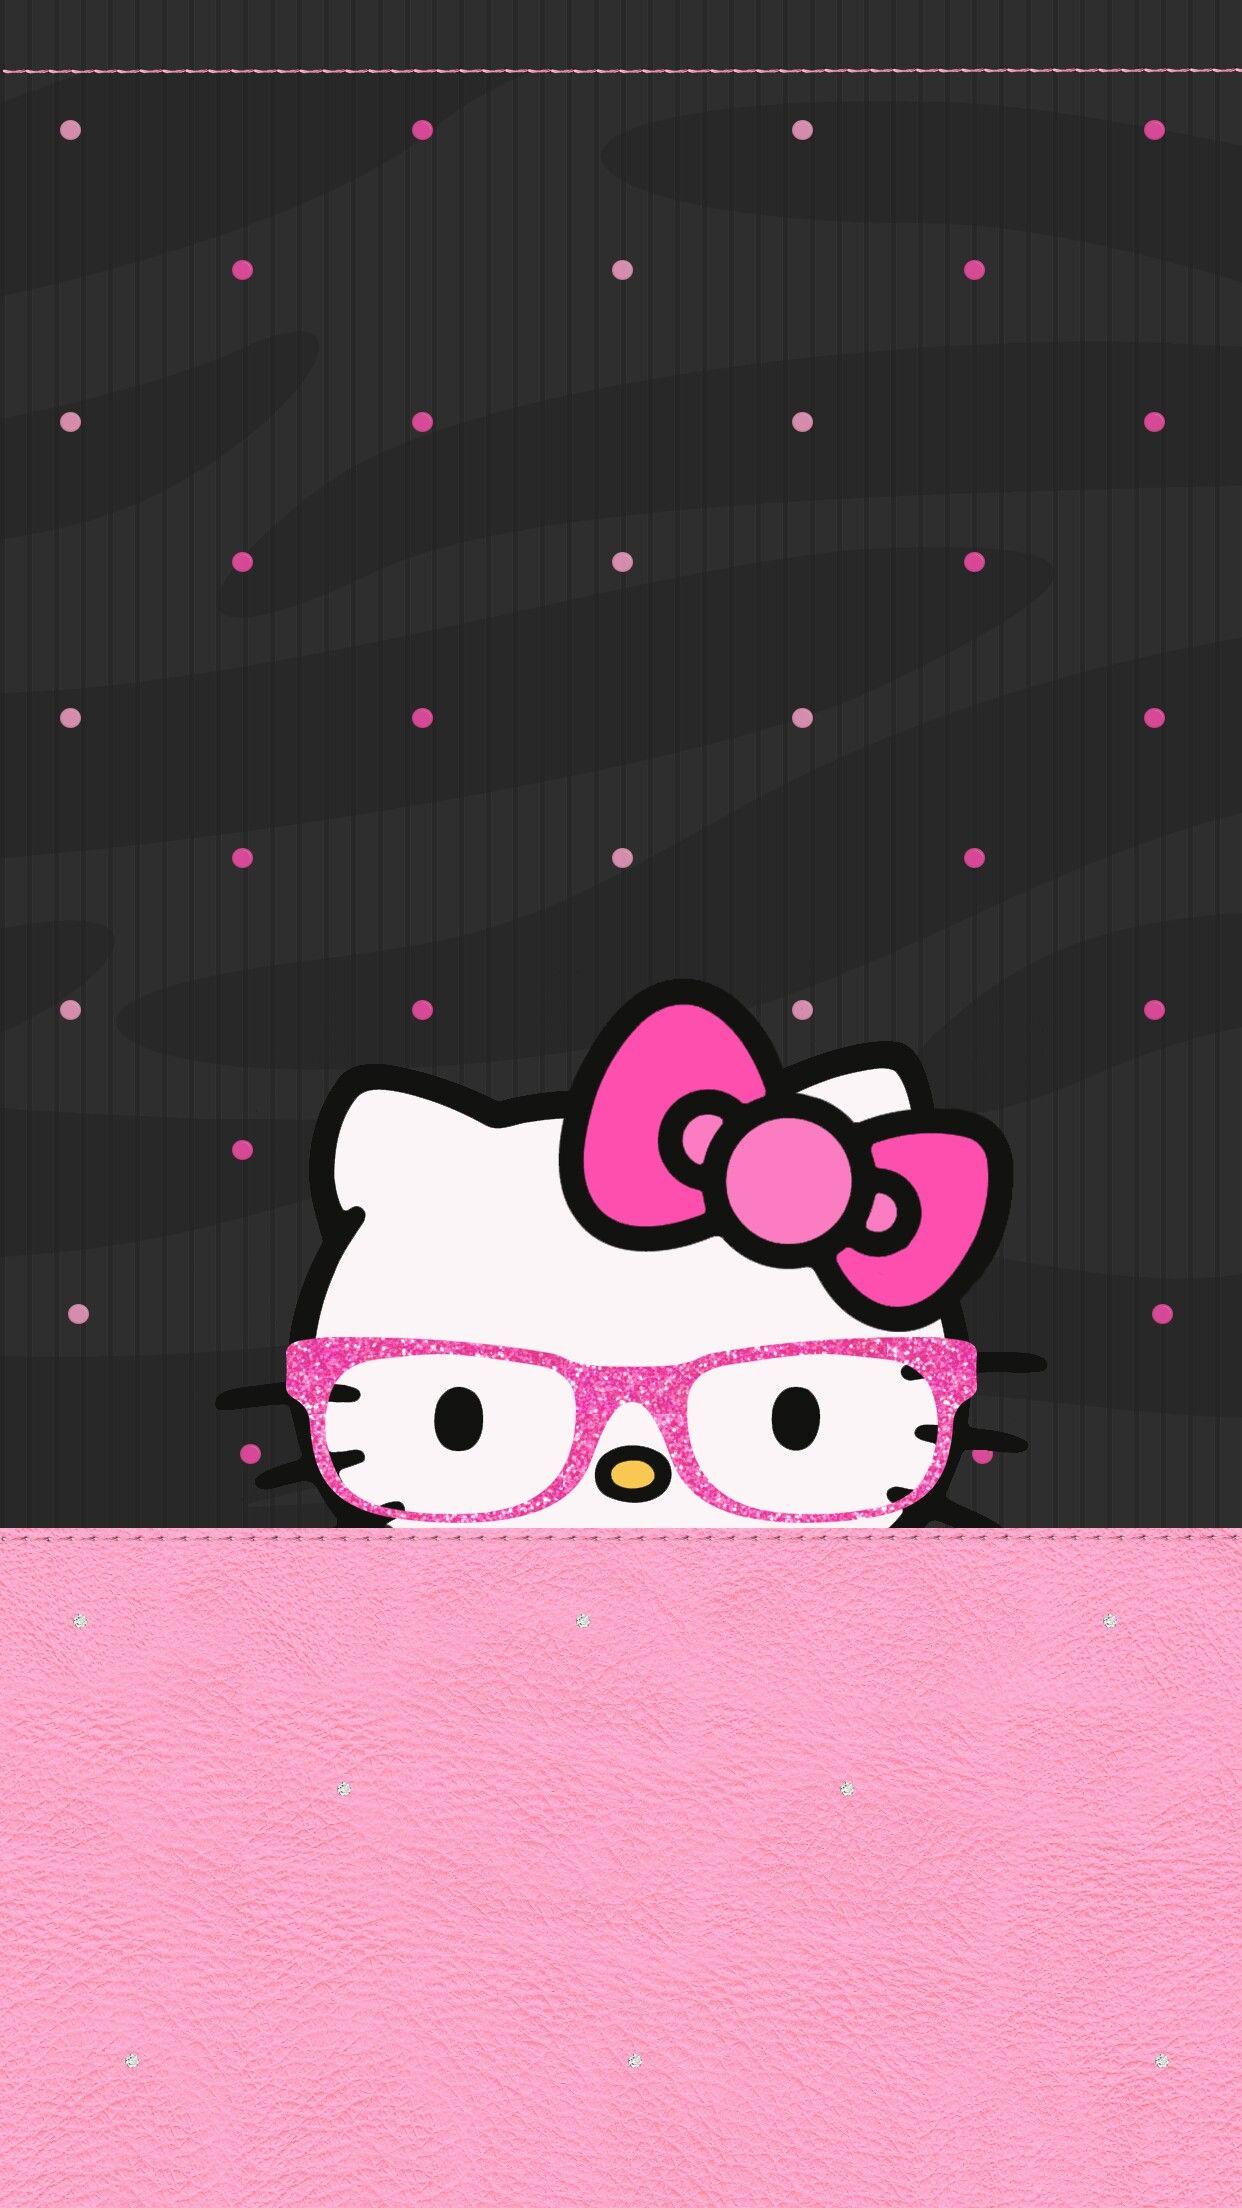 Simple Wallpaper Hello Kitty Glitter - b08431194645efa1d492d0dc5d69854f  Best Photo Reference_757279.jpg